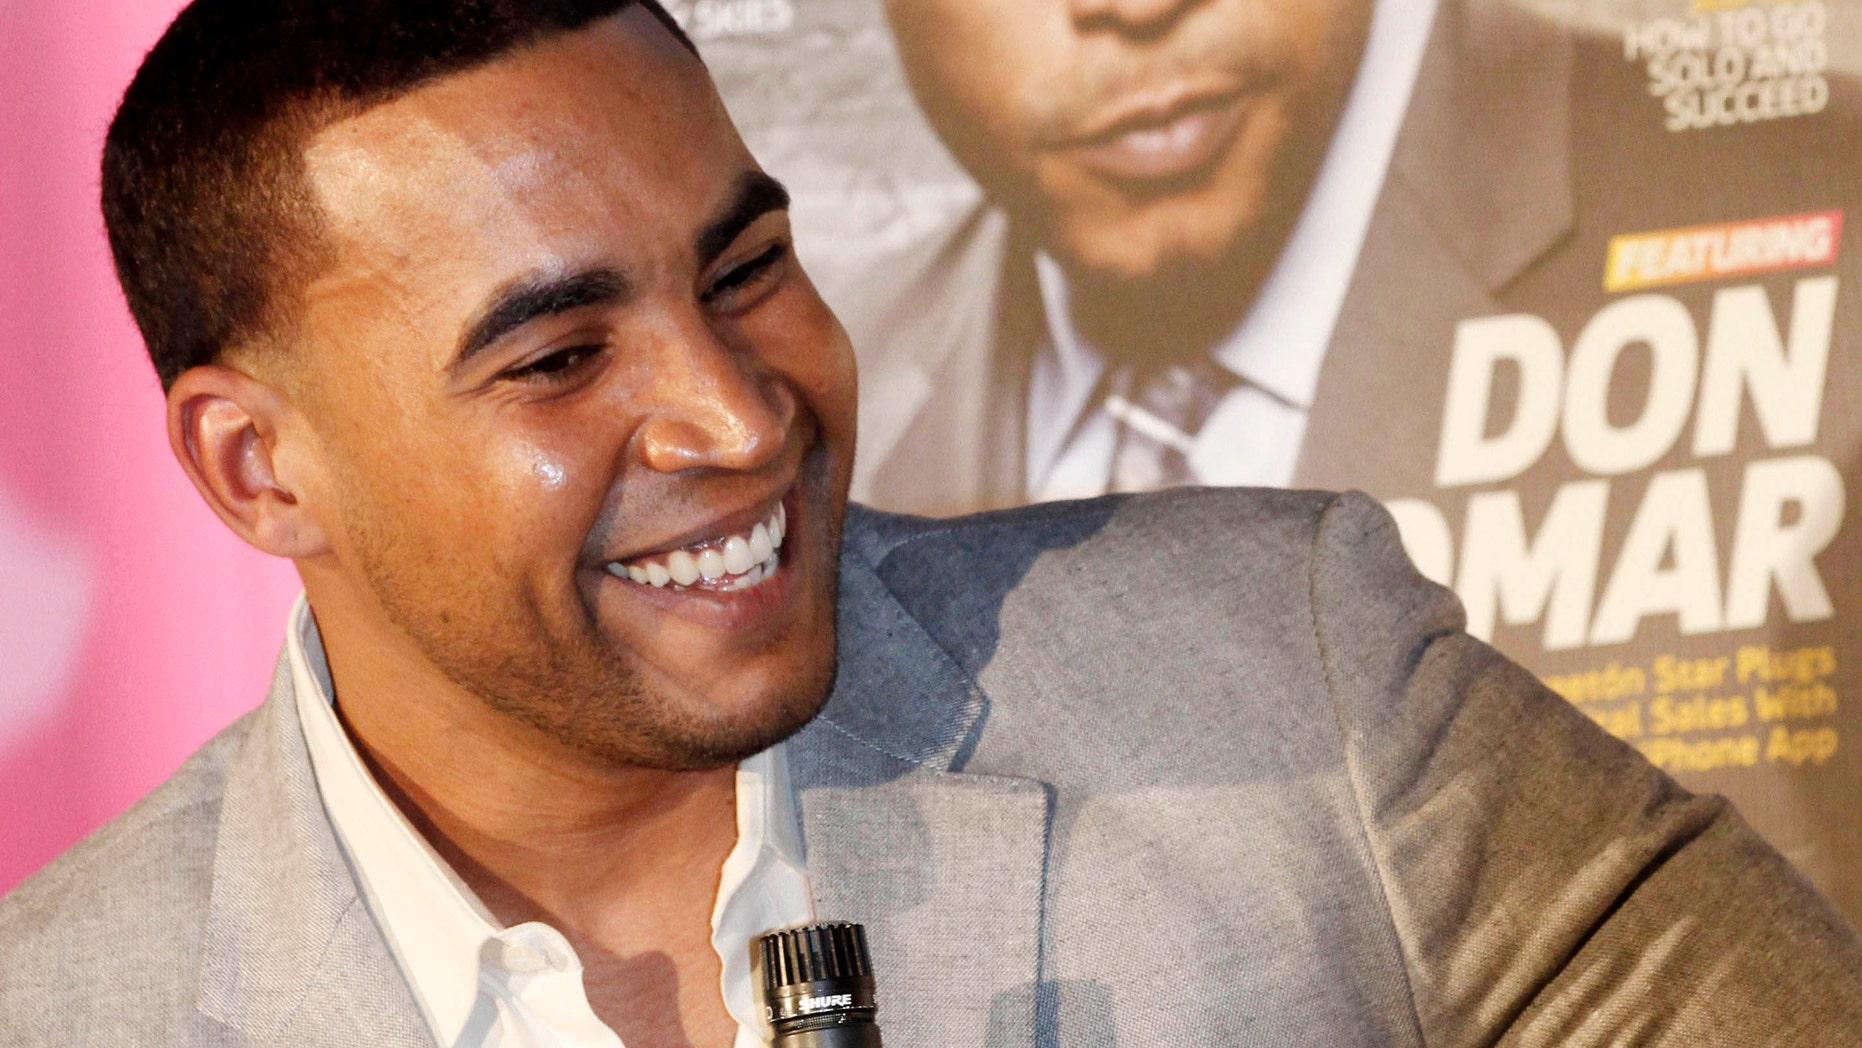 Puerto Rican reggaeton singer-rapper Don Omar smiles as he talks to a reporter in Miami on Tuesday. (AP Photo/Alan Diaz)